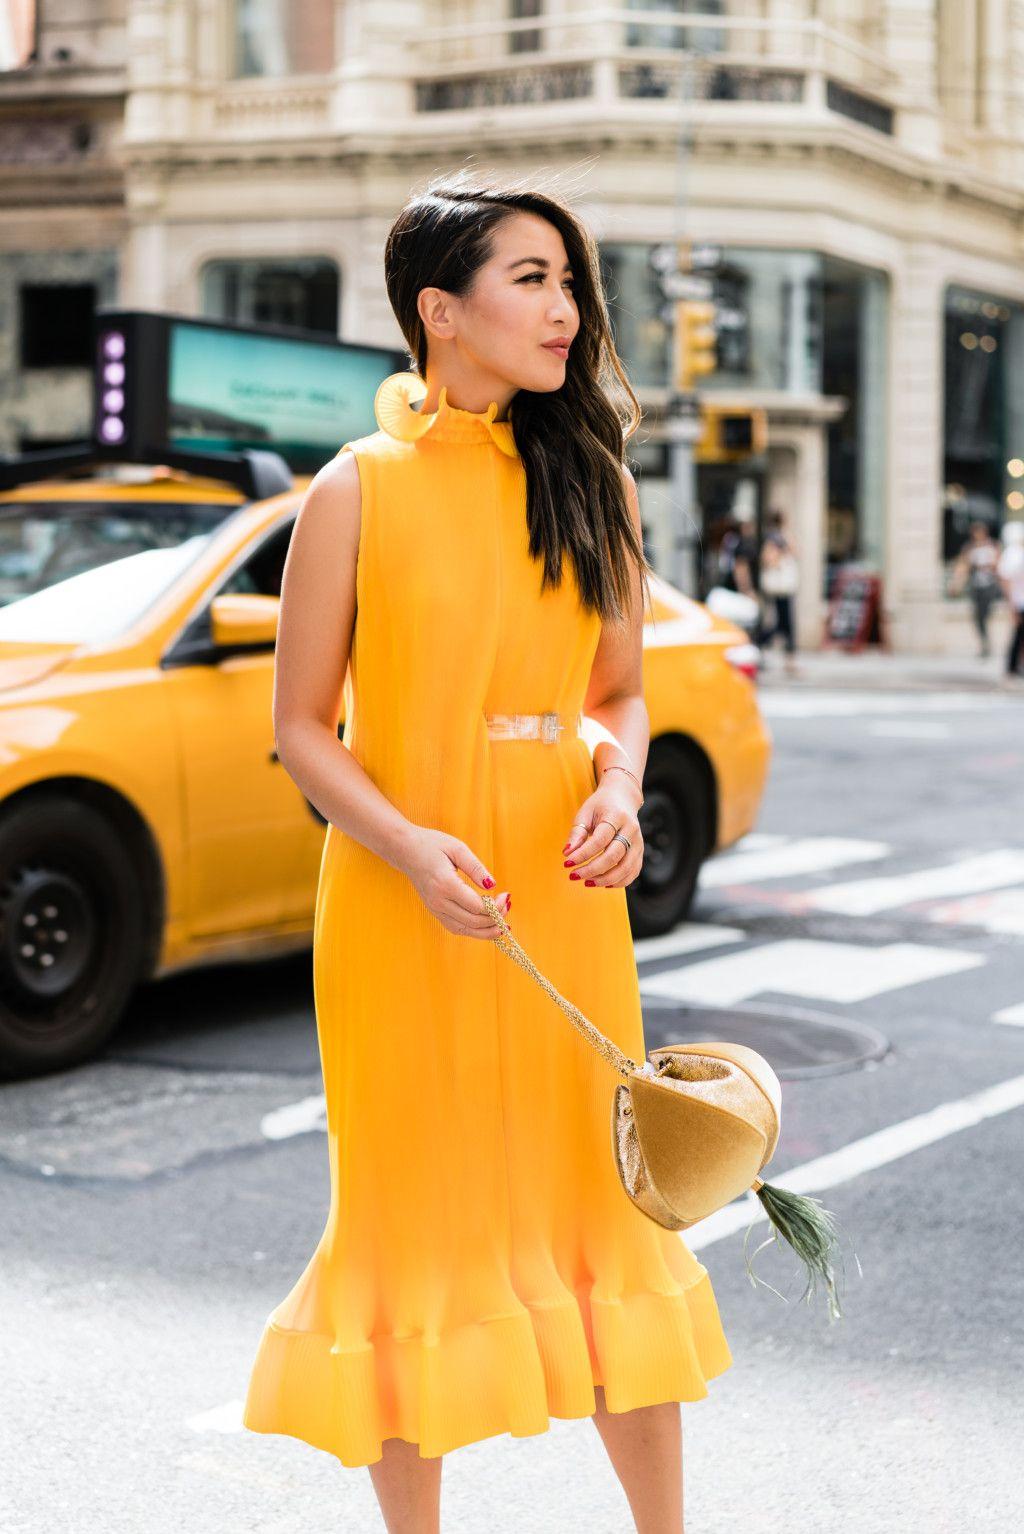 Such A Beautiful Summer Statement Dress Wendy S Lookbook Dresses Classy Dress Statement Dress [ 1534 x 1024 Pixel ]